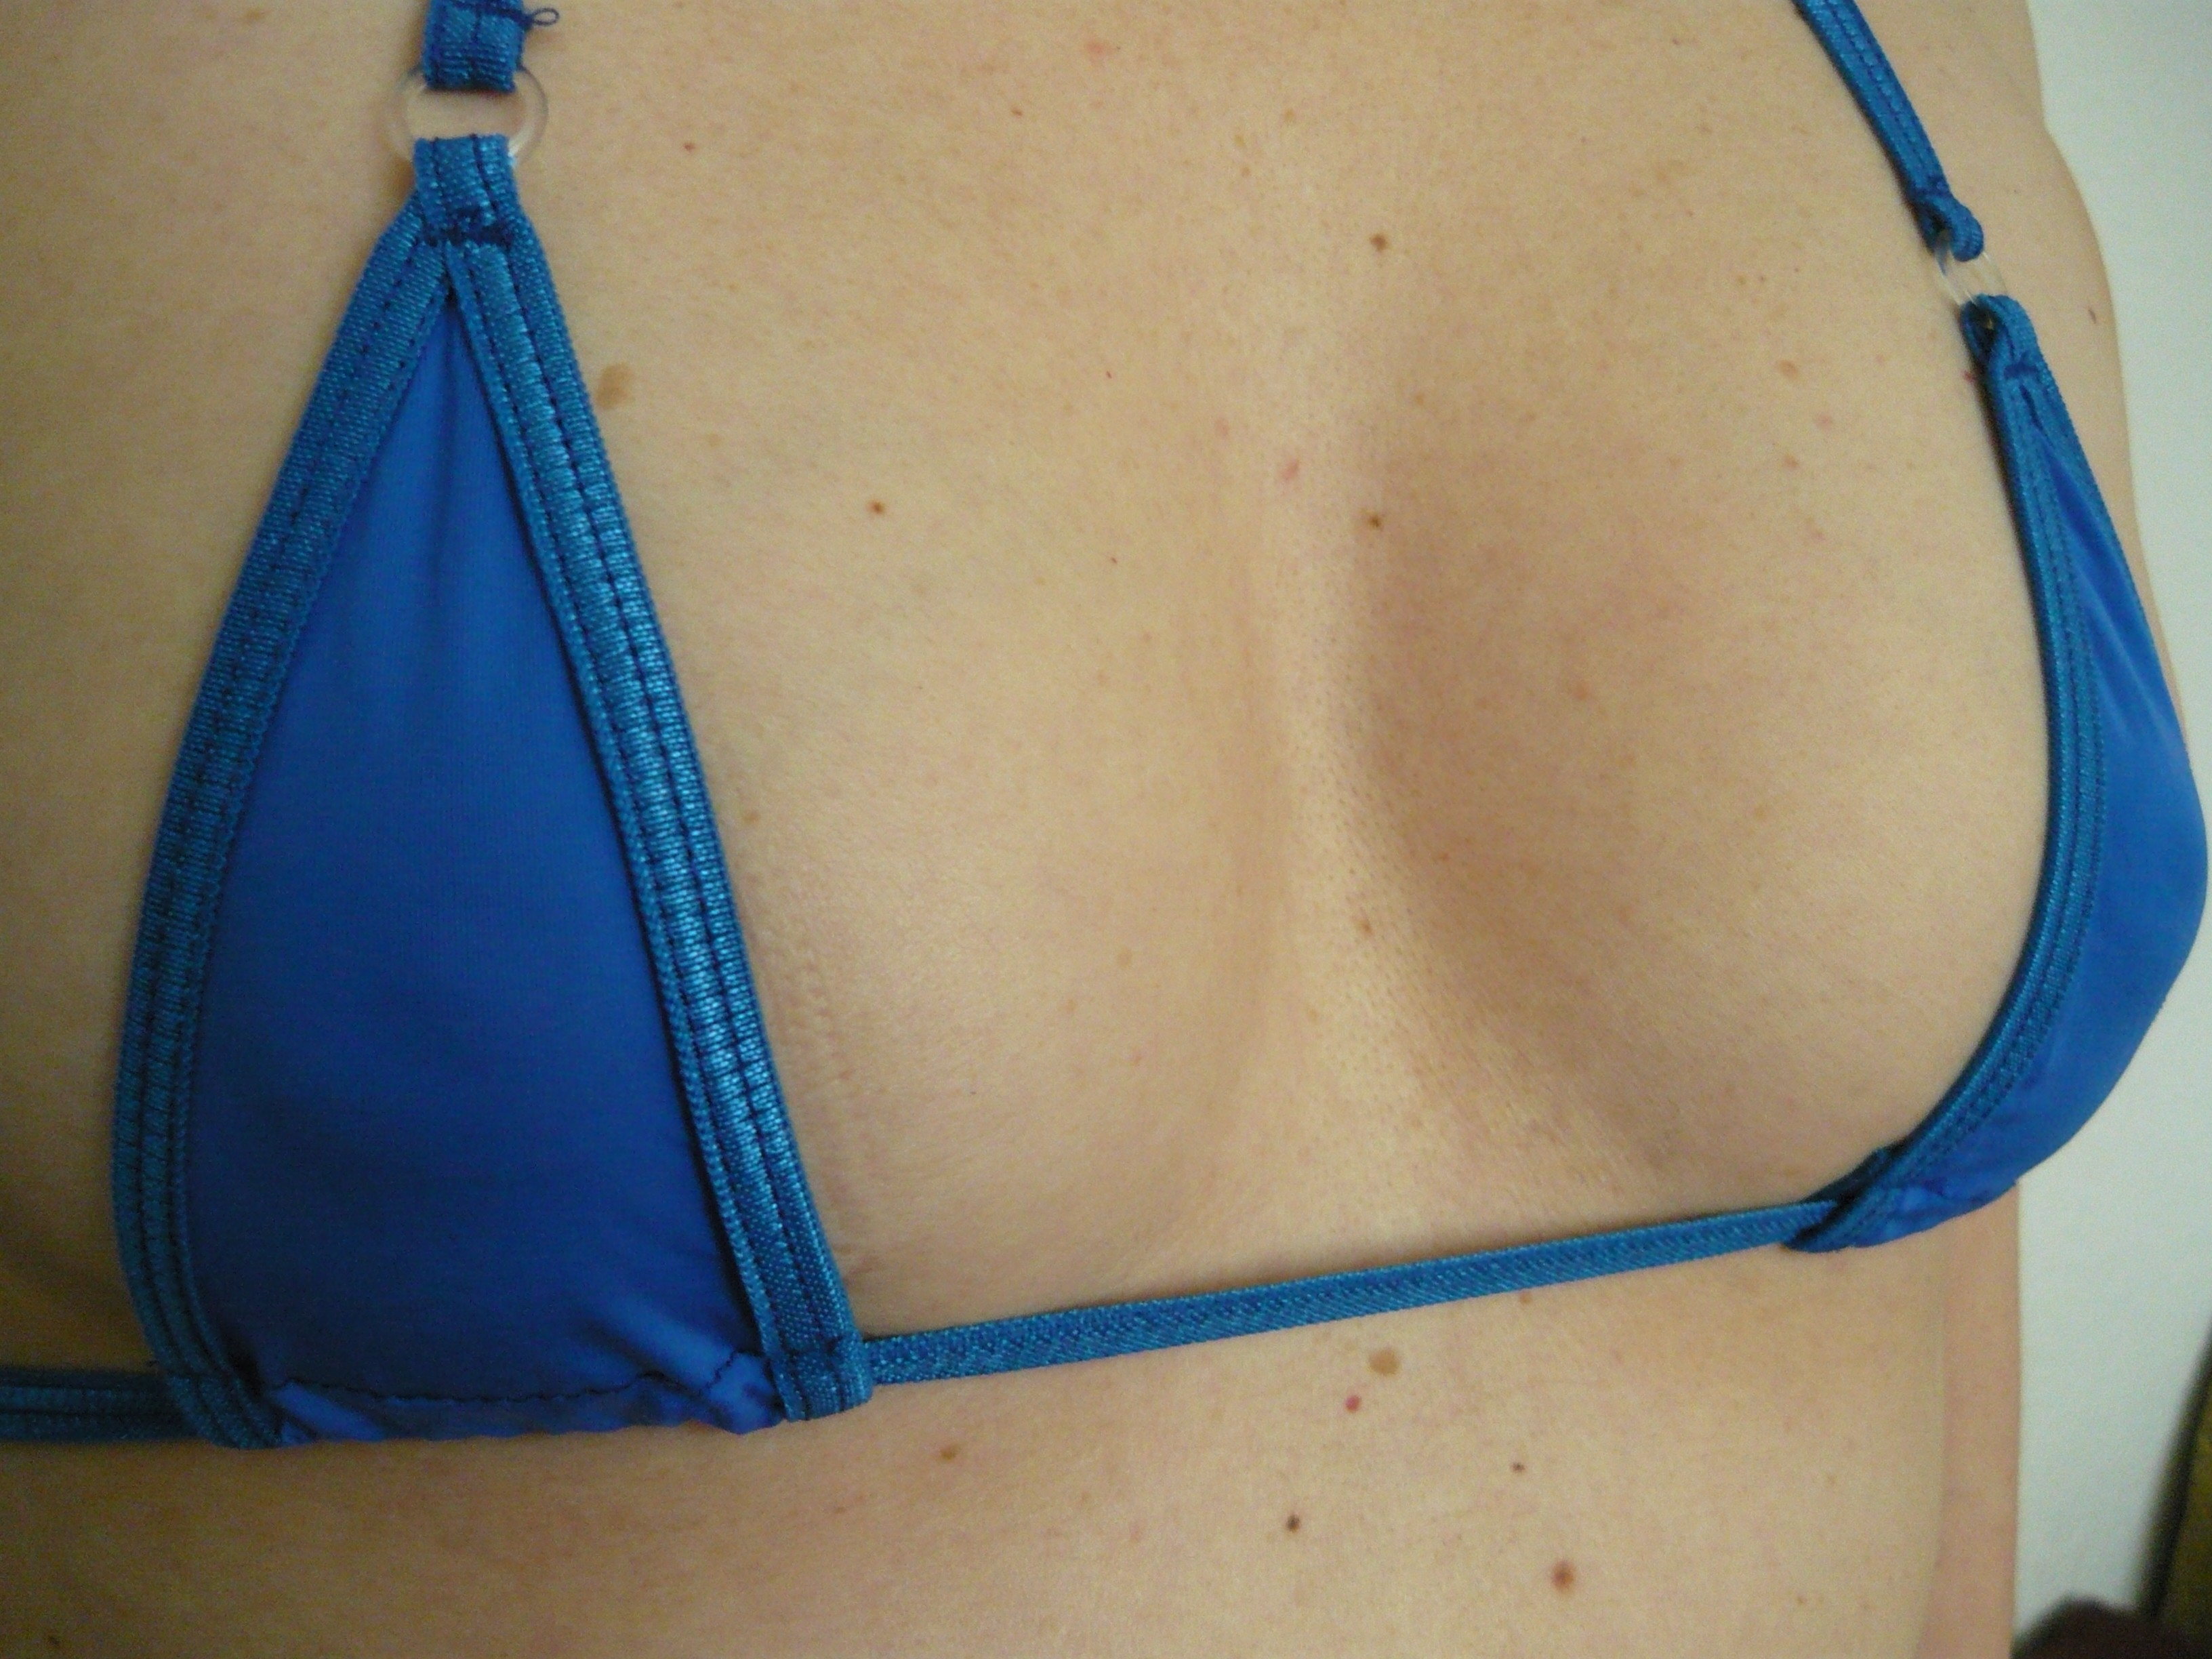 Women Sexy Micro Mini Bikini Thong Underwear G-String Bra Swimwear Sleepwear New High Quality Swimwear